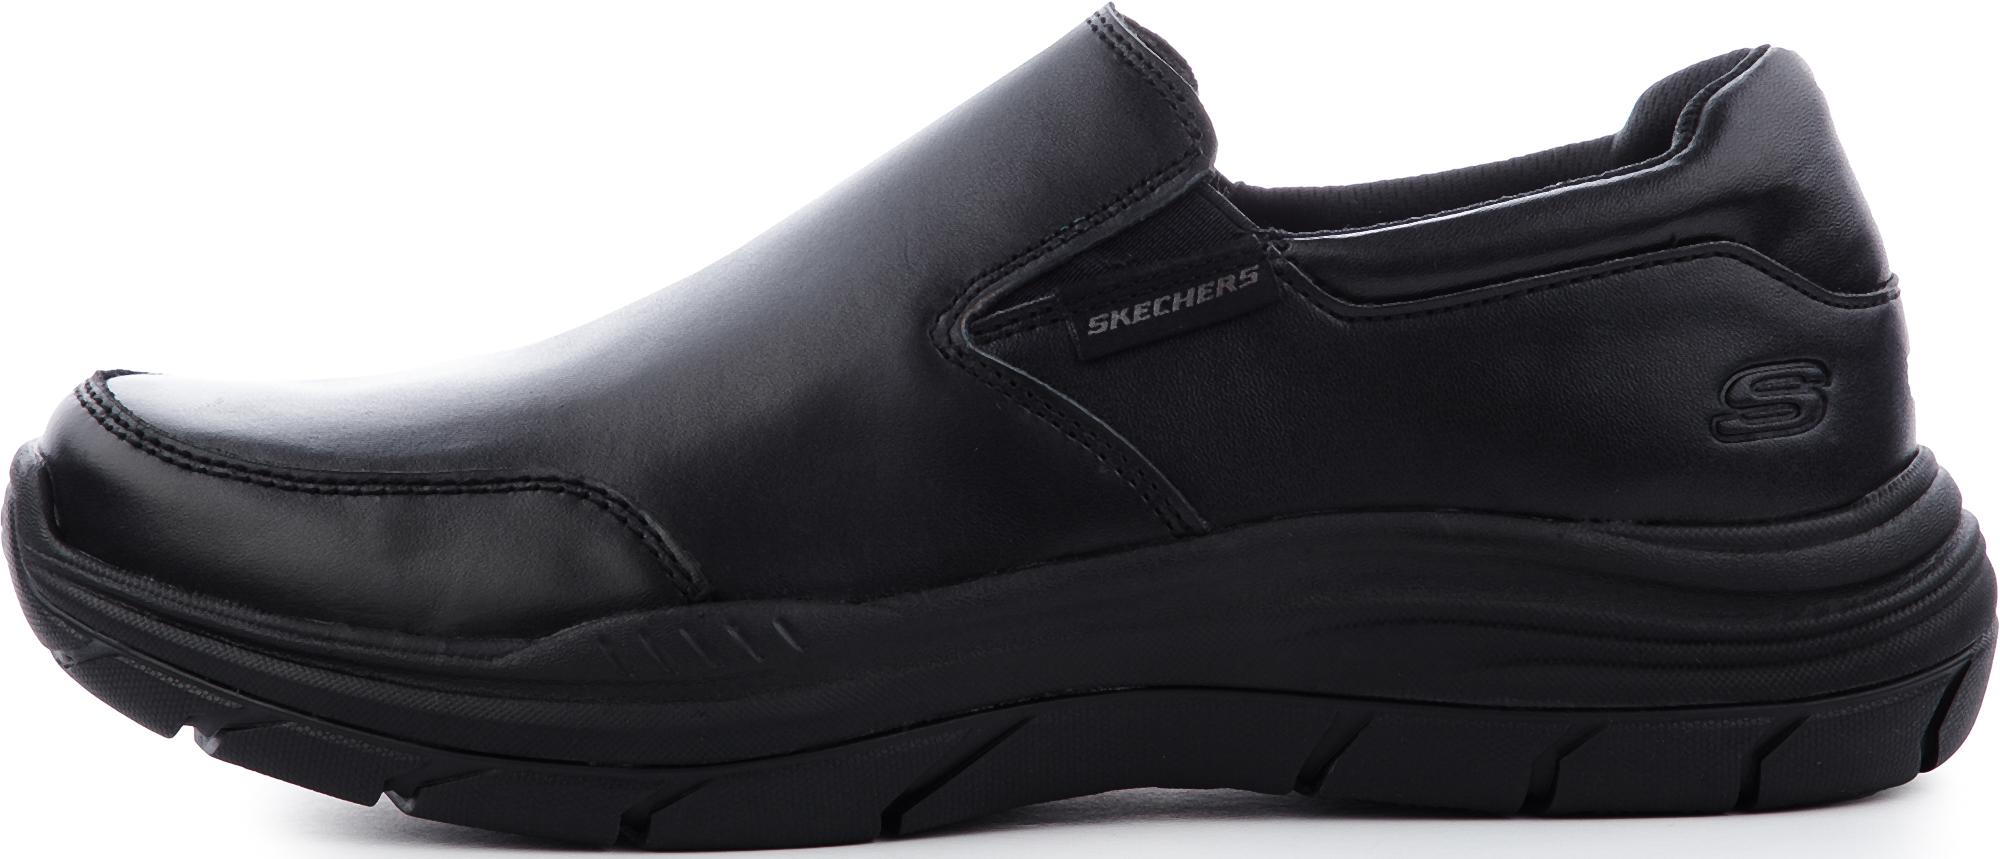 Skechers Ботинки мужские Expected 2.0-Olego, размер 46